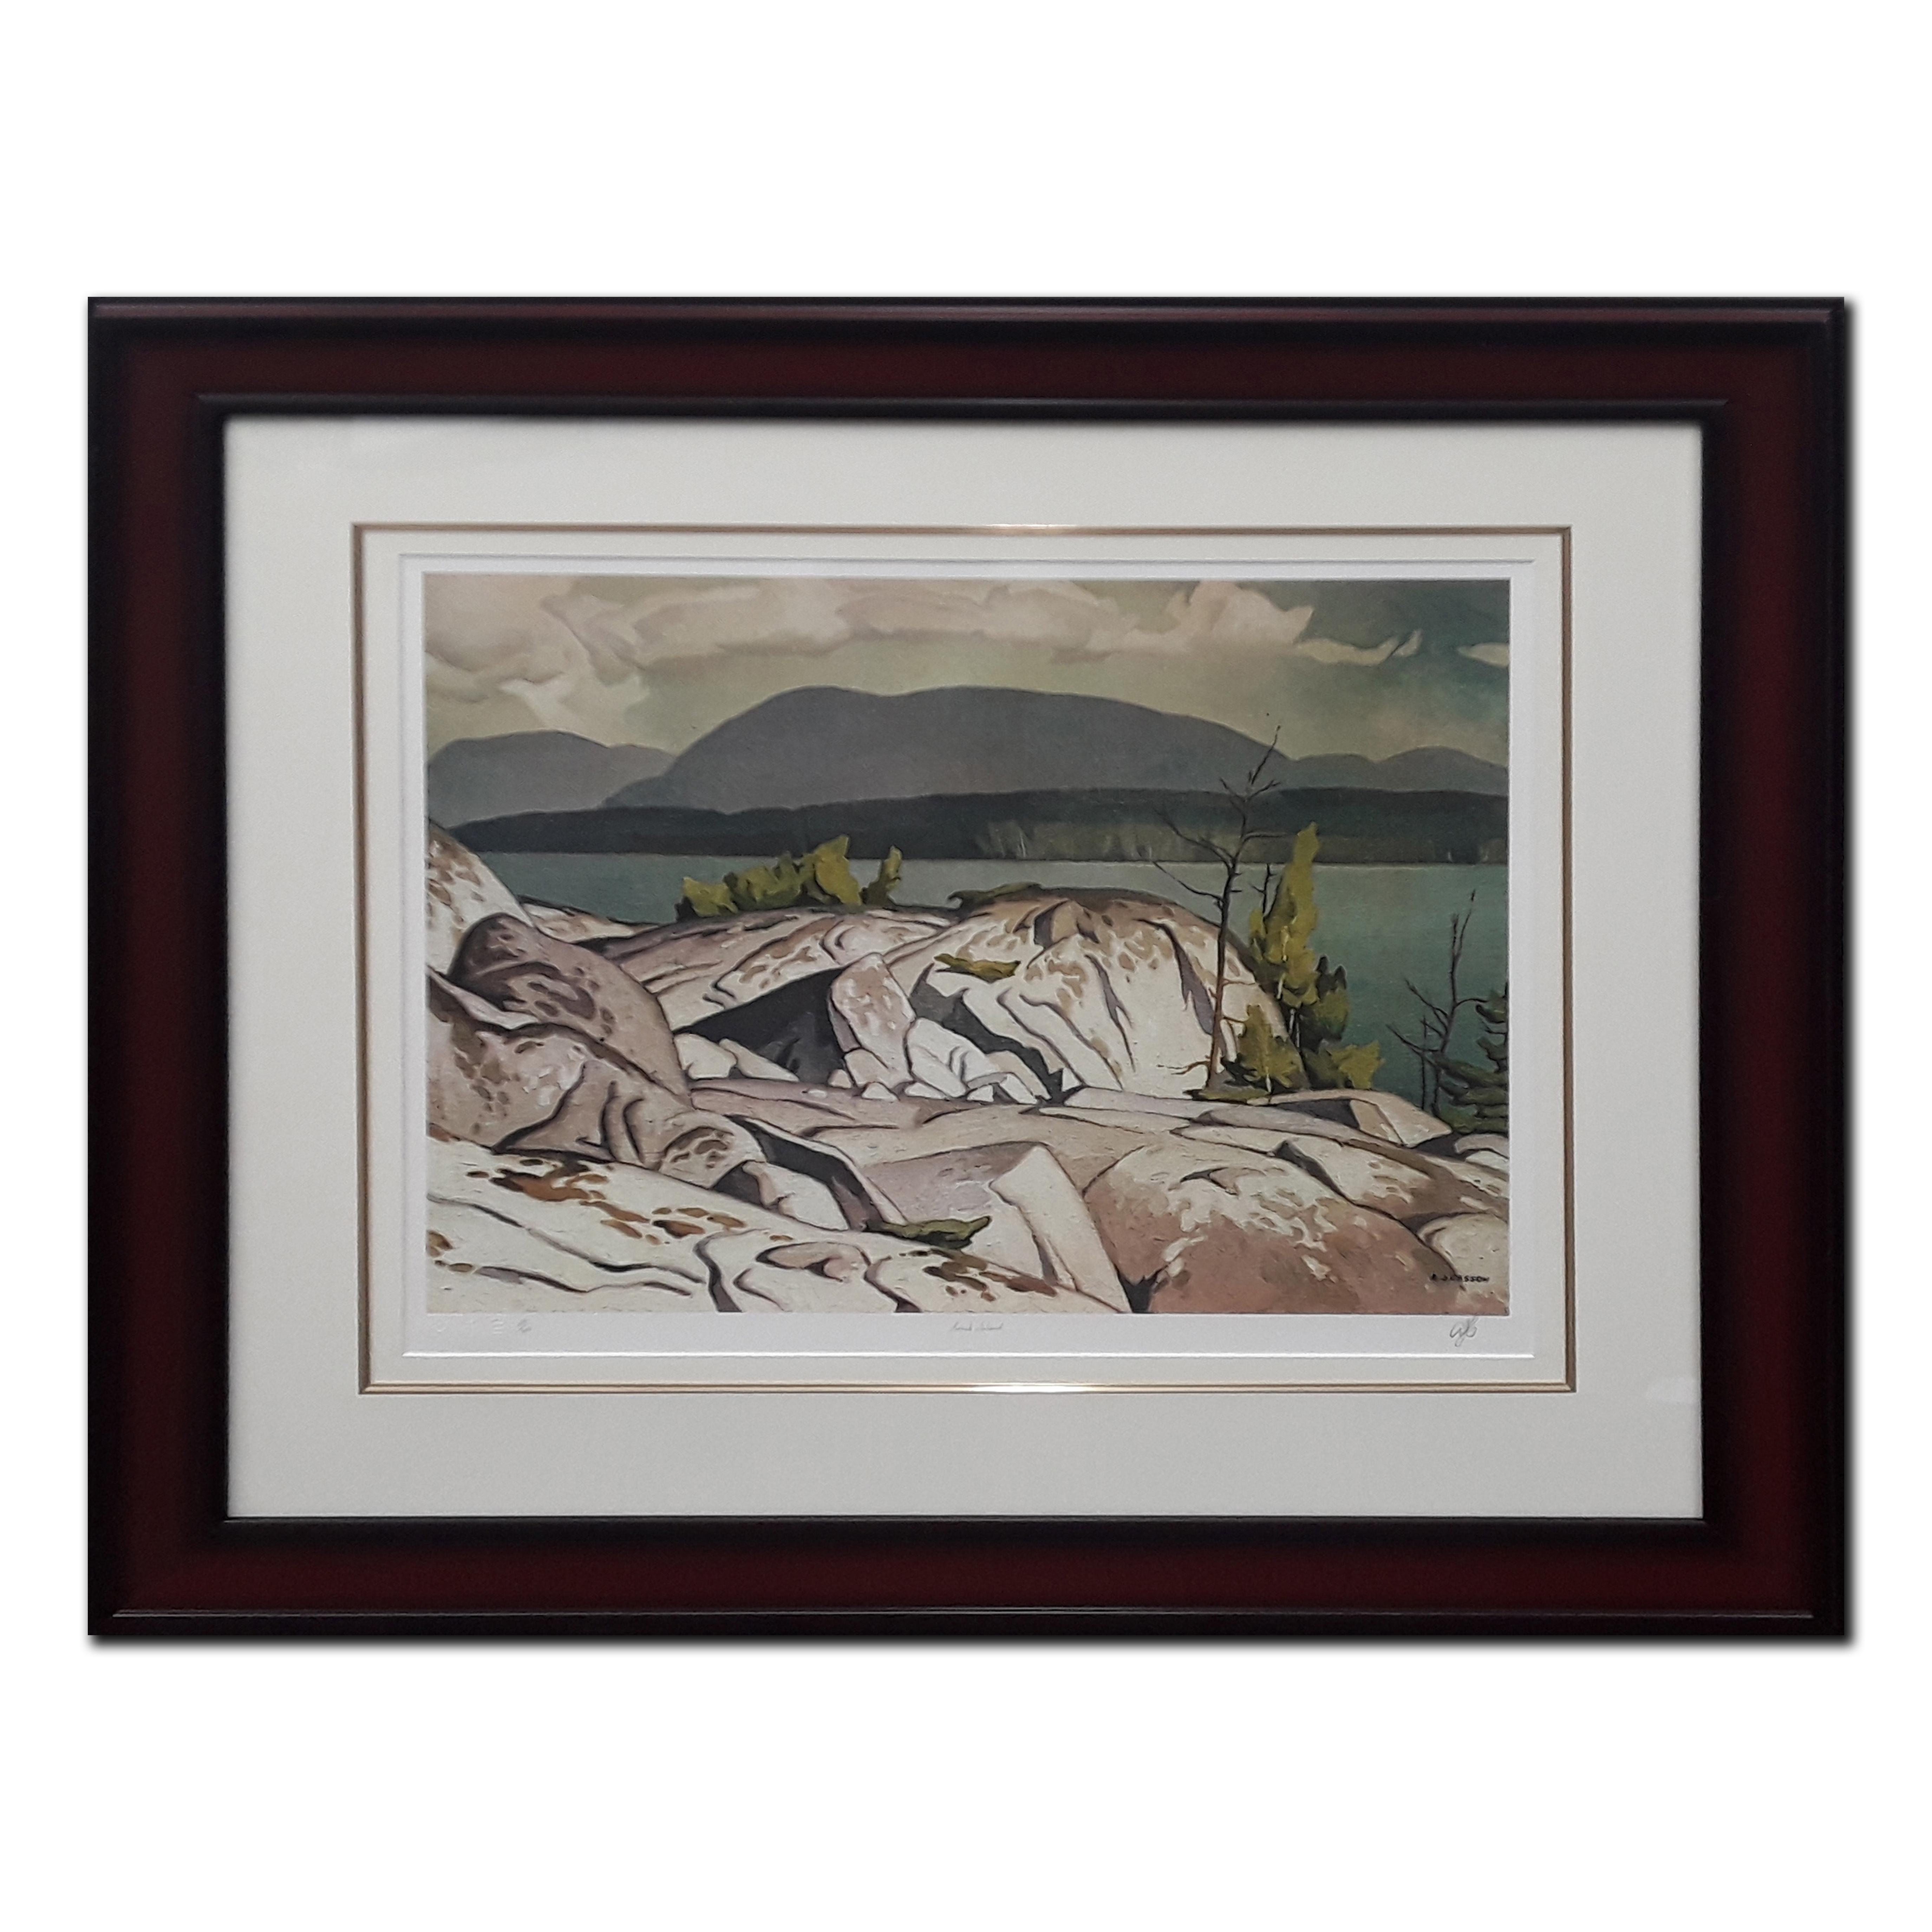 "AJ Casson's ""Birch Island"" Limited Edition Framed Print"